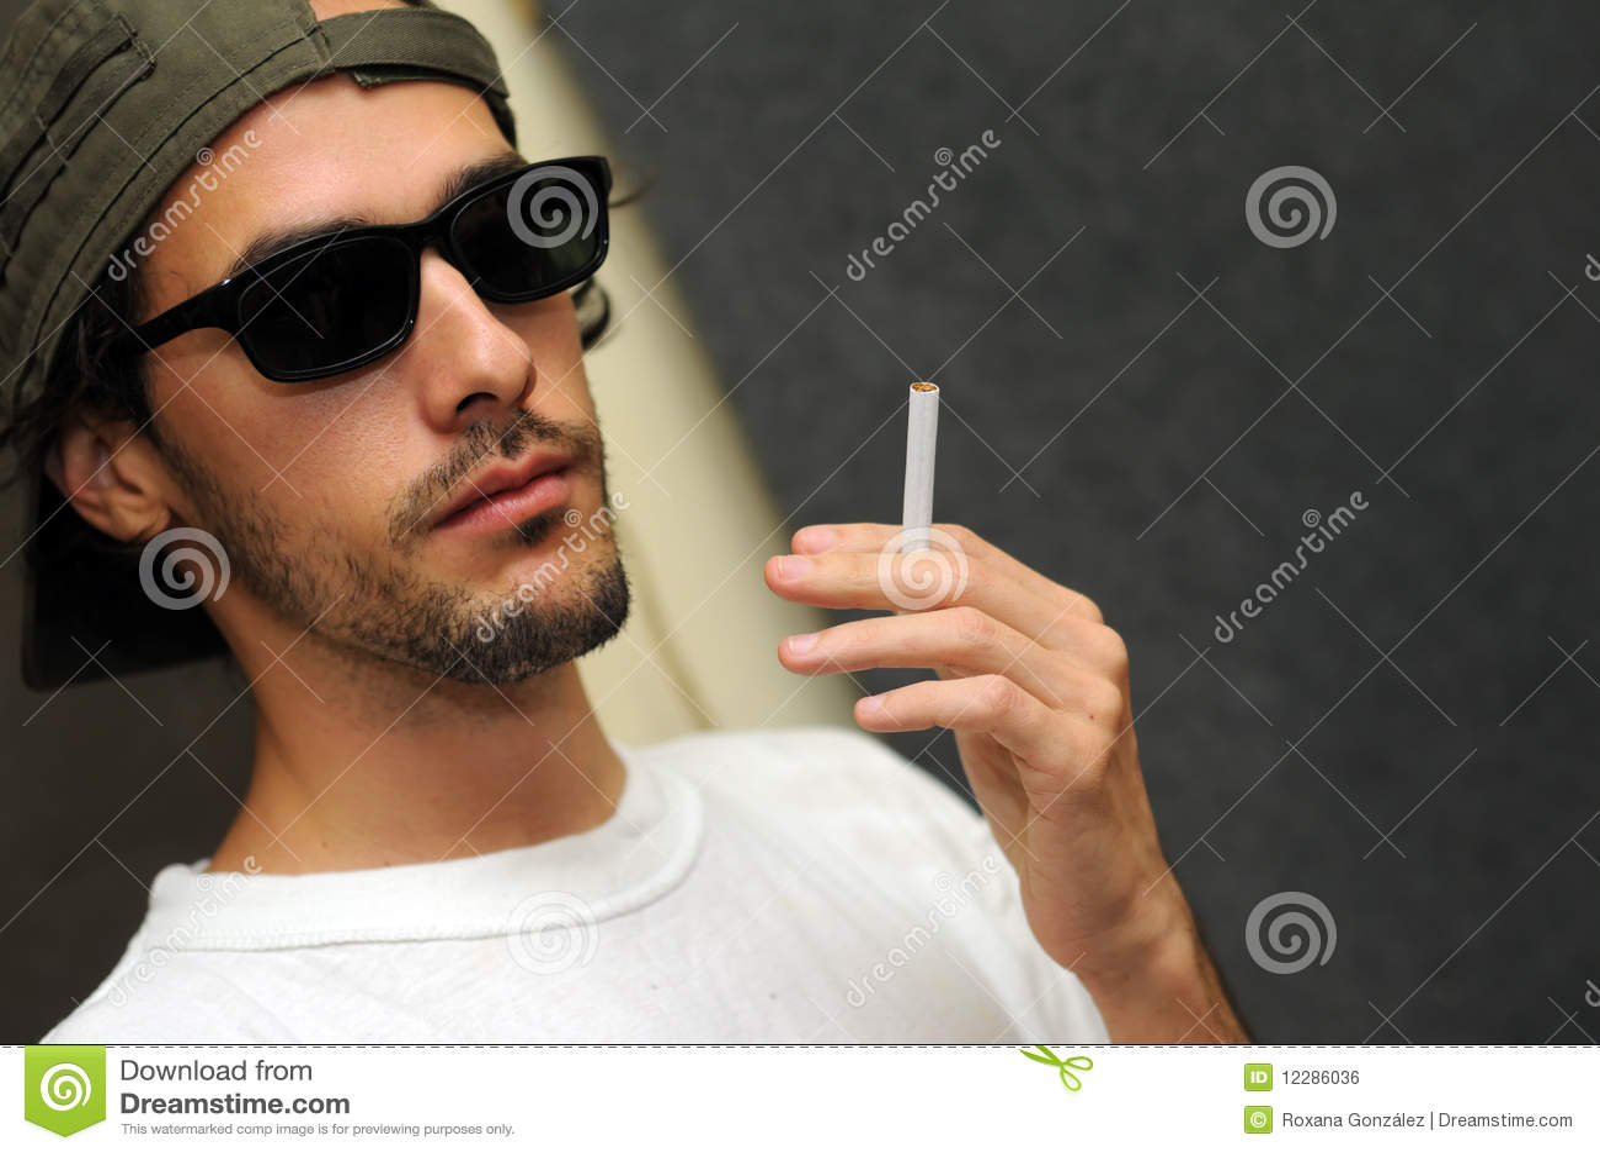 Guy Holding Cigarette Royalty Free Stock Image - Image ... Young Businessman Fashion